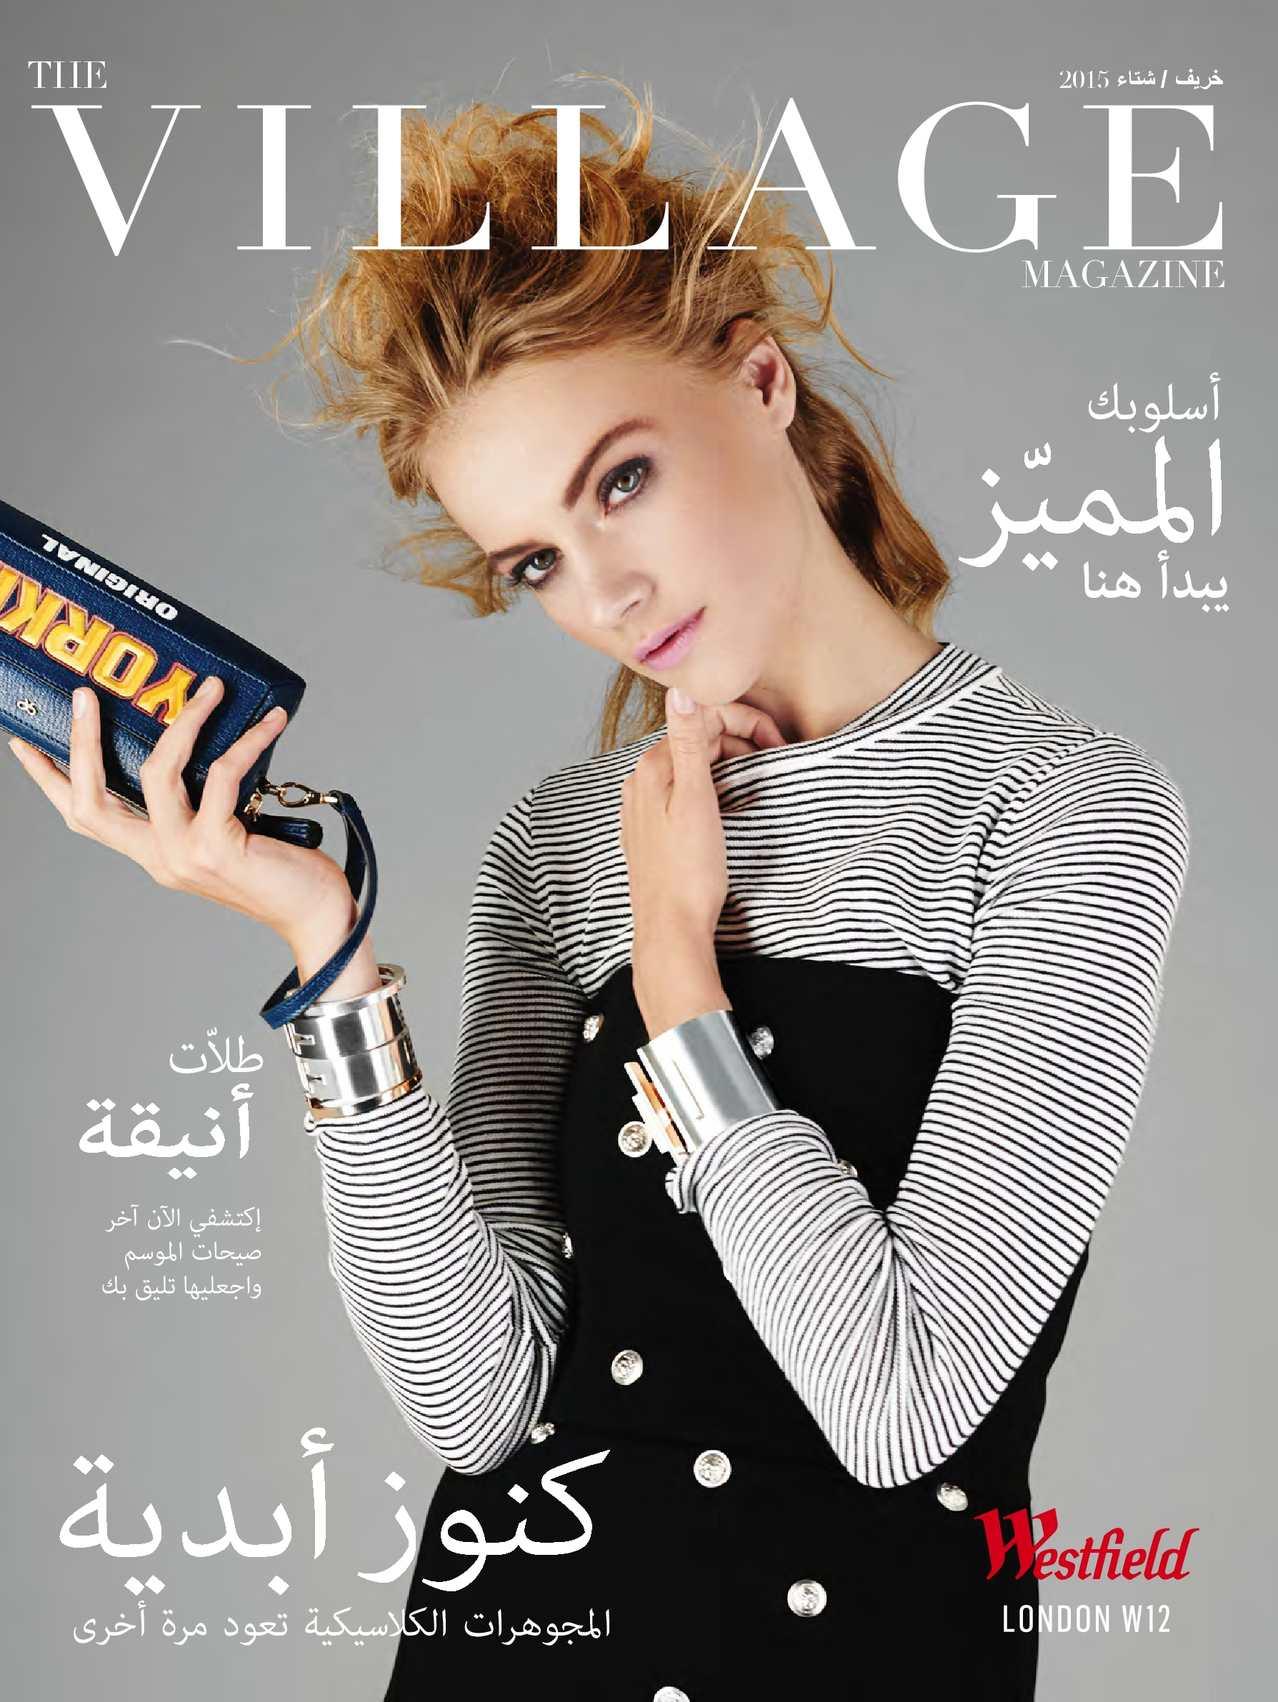 8e4705eab Calaméo - WESTFIELD THE VILLAGE ARABIC MAGAZINE 2015